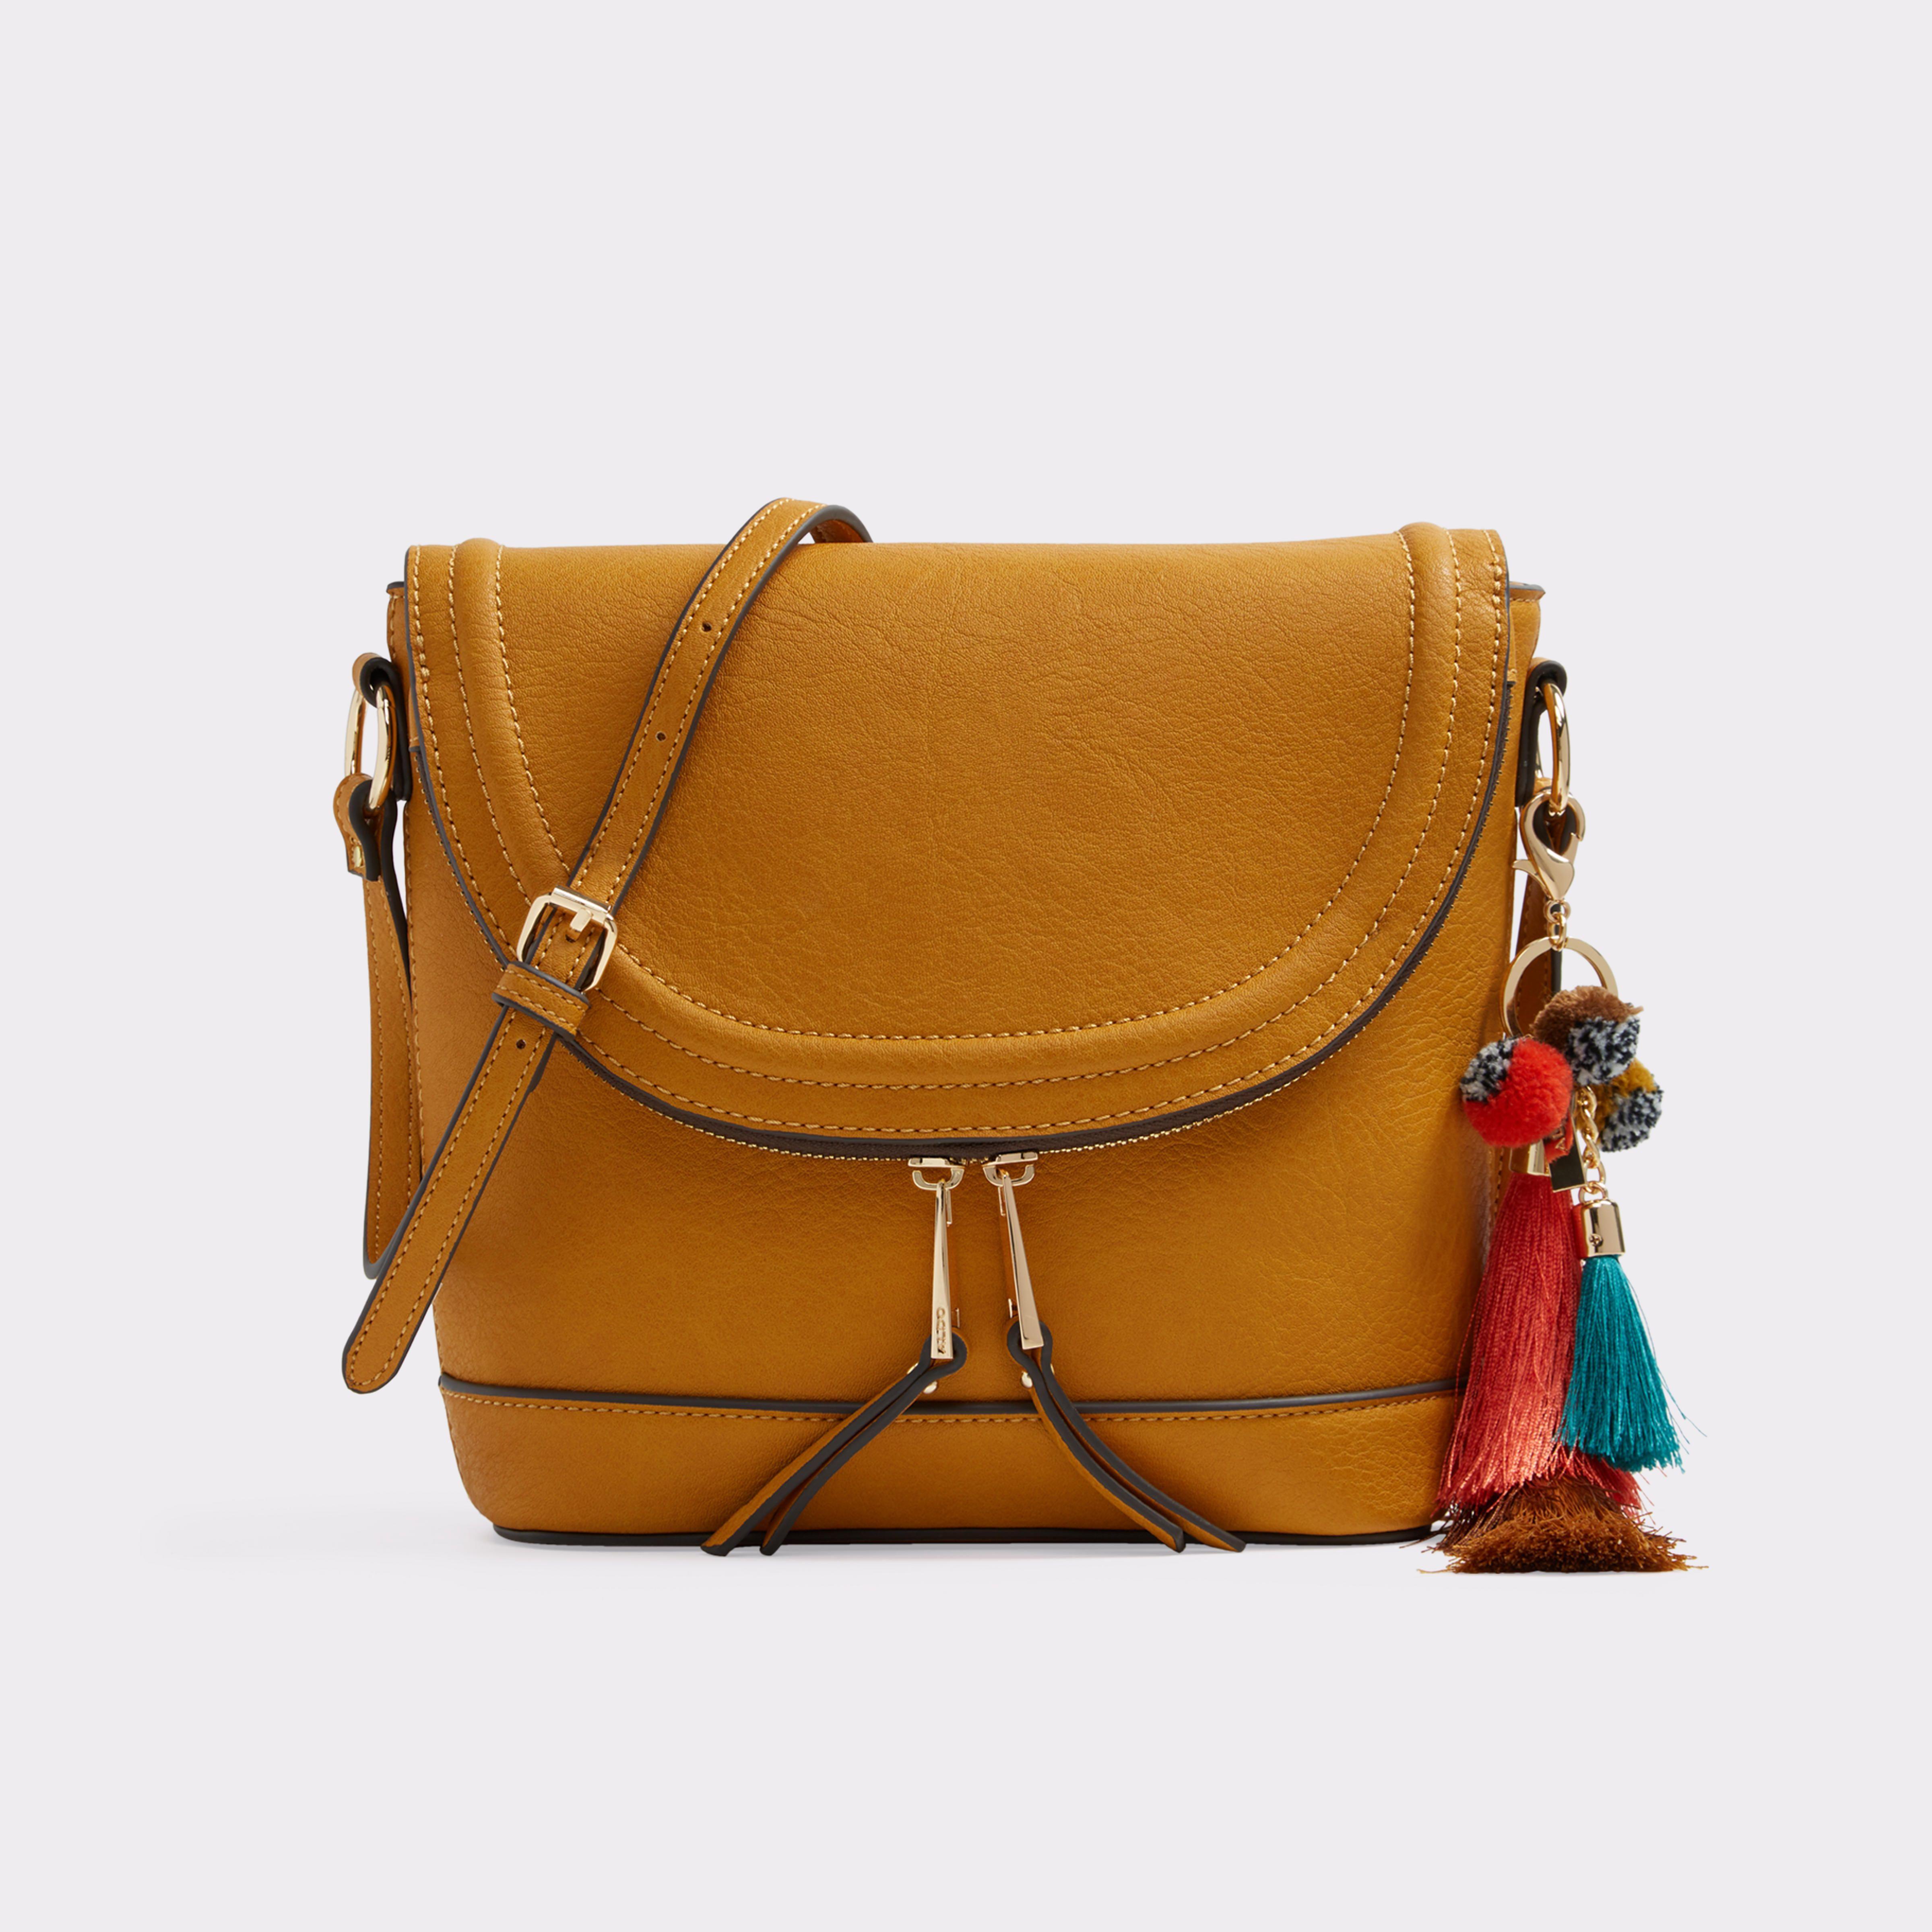 89b787d754 Derovina Mustard Women's Crossbody | ALDO US | Fashion Shoes Call It ...